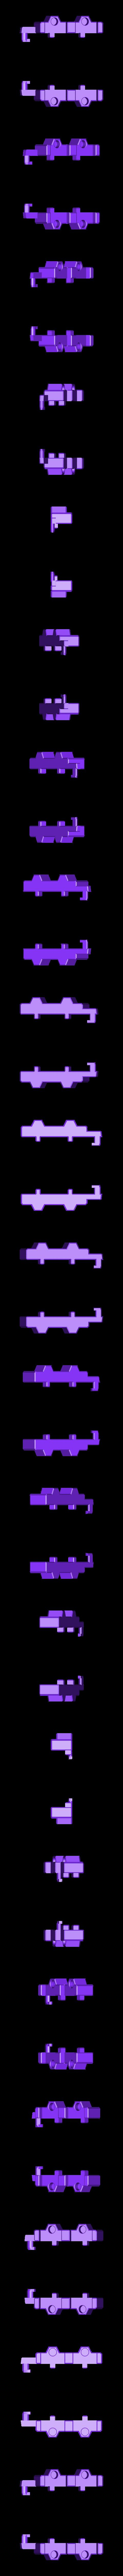 SmallToys-TrainBaseWagon1.stl Download STL file SmallToys - Starter Pack • 3D printer model, Wabby